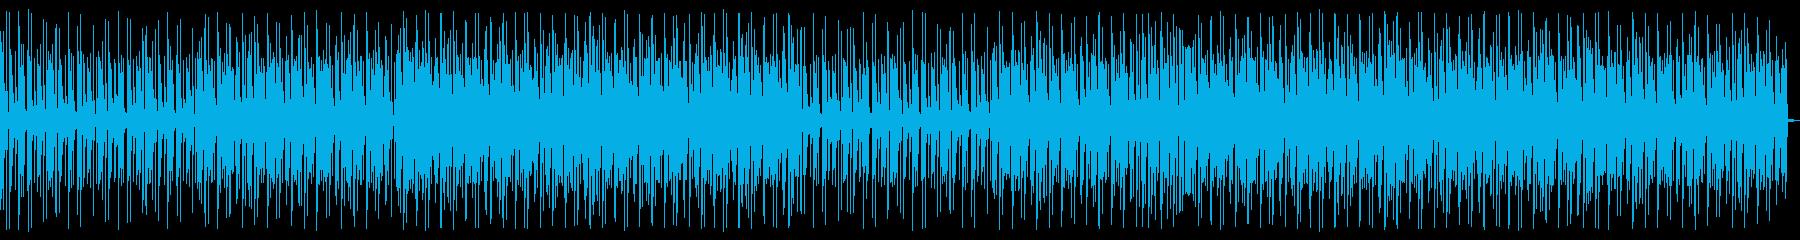 Digital. graphic. Techno_2's reproduced waveform